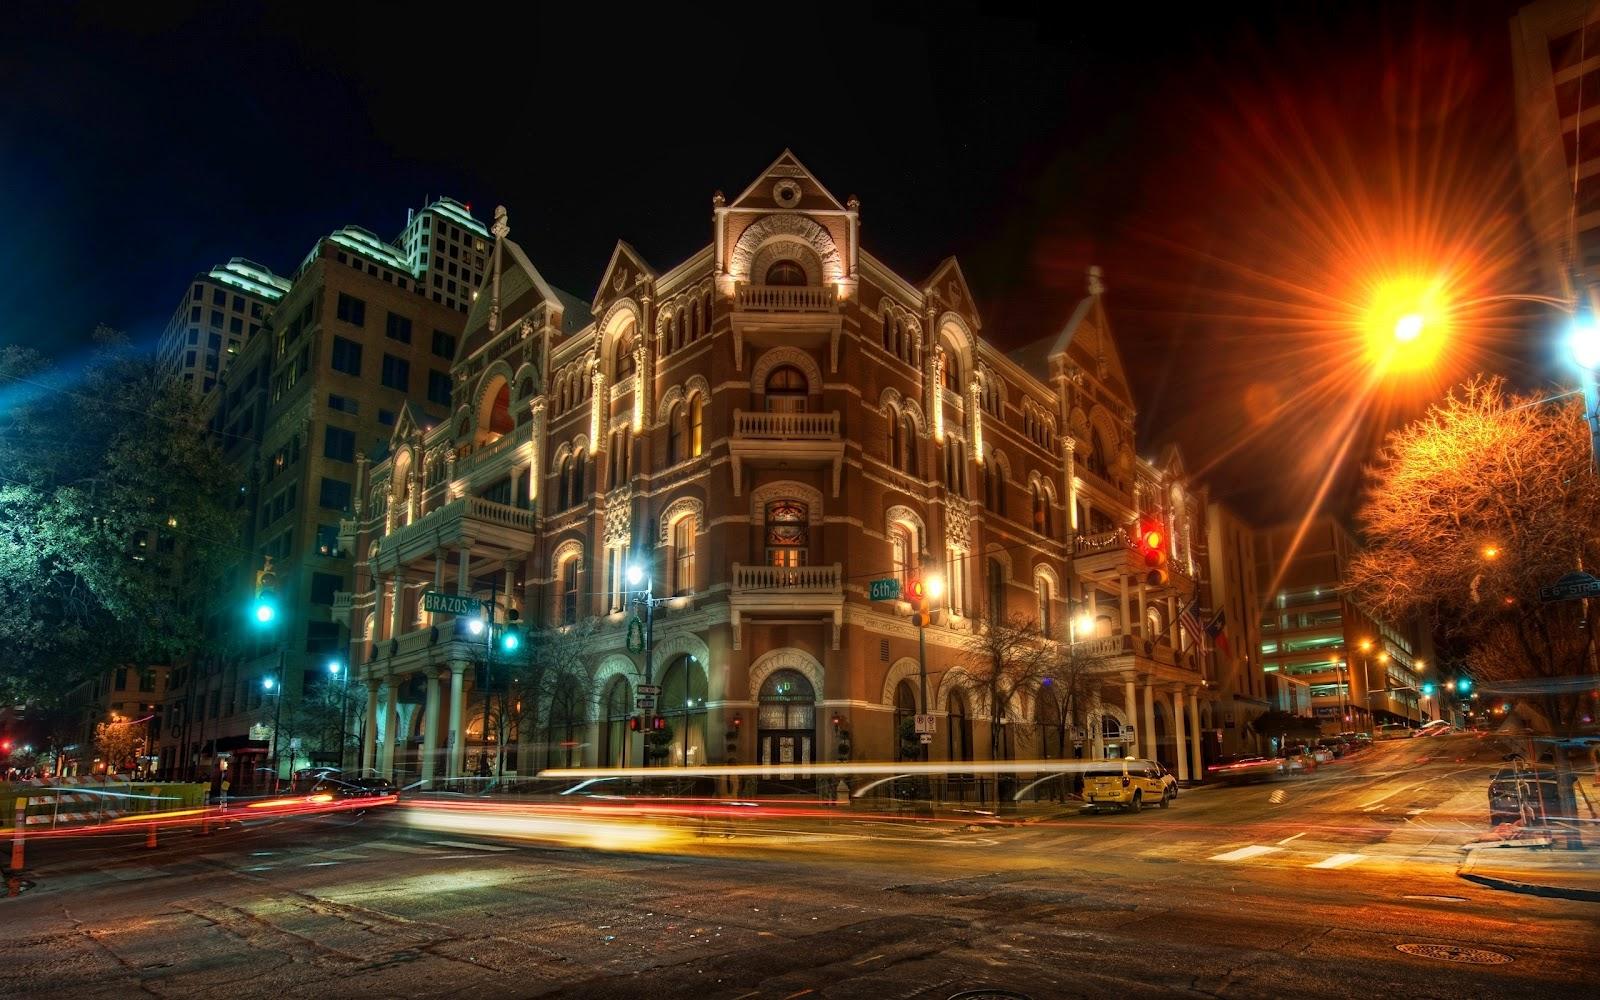 Cities_Night__Road__Buildings_023747_